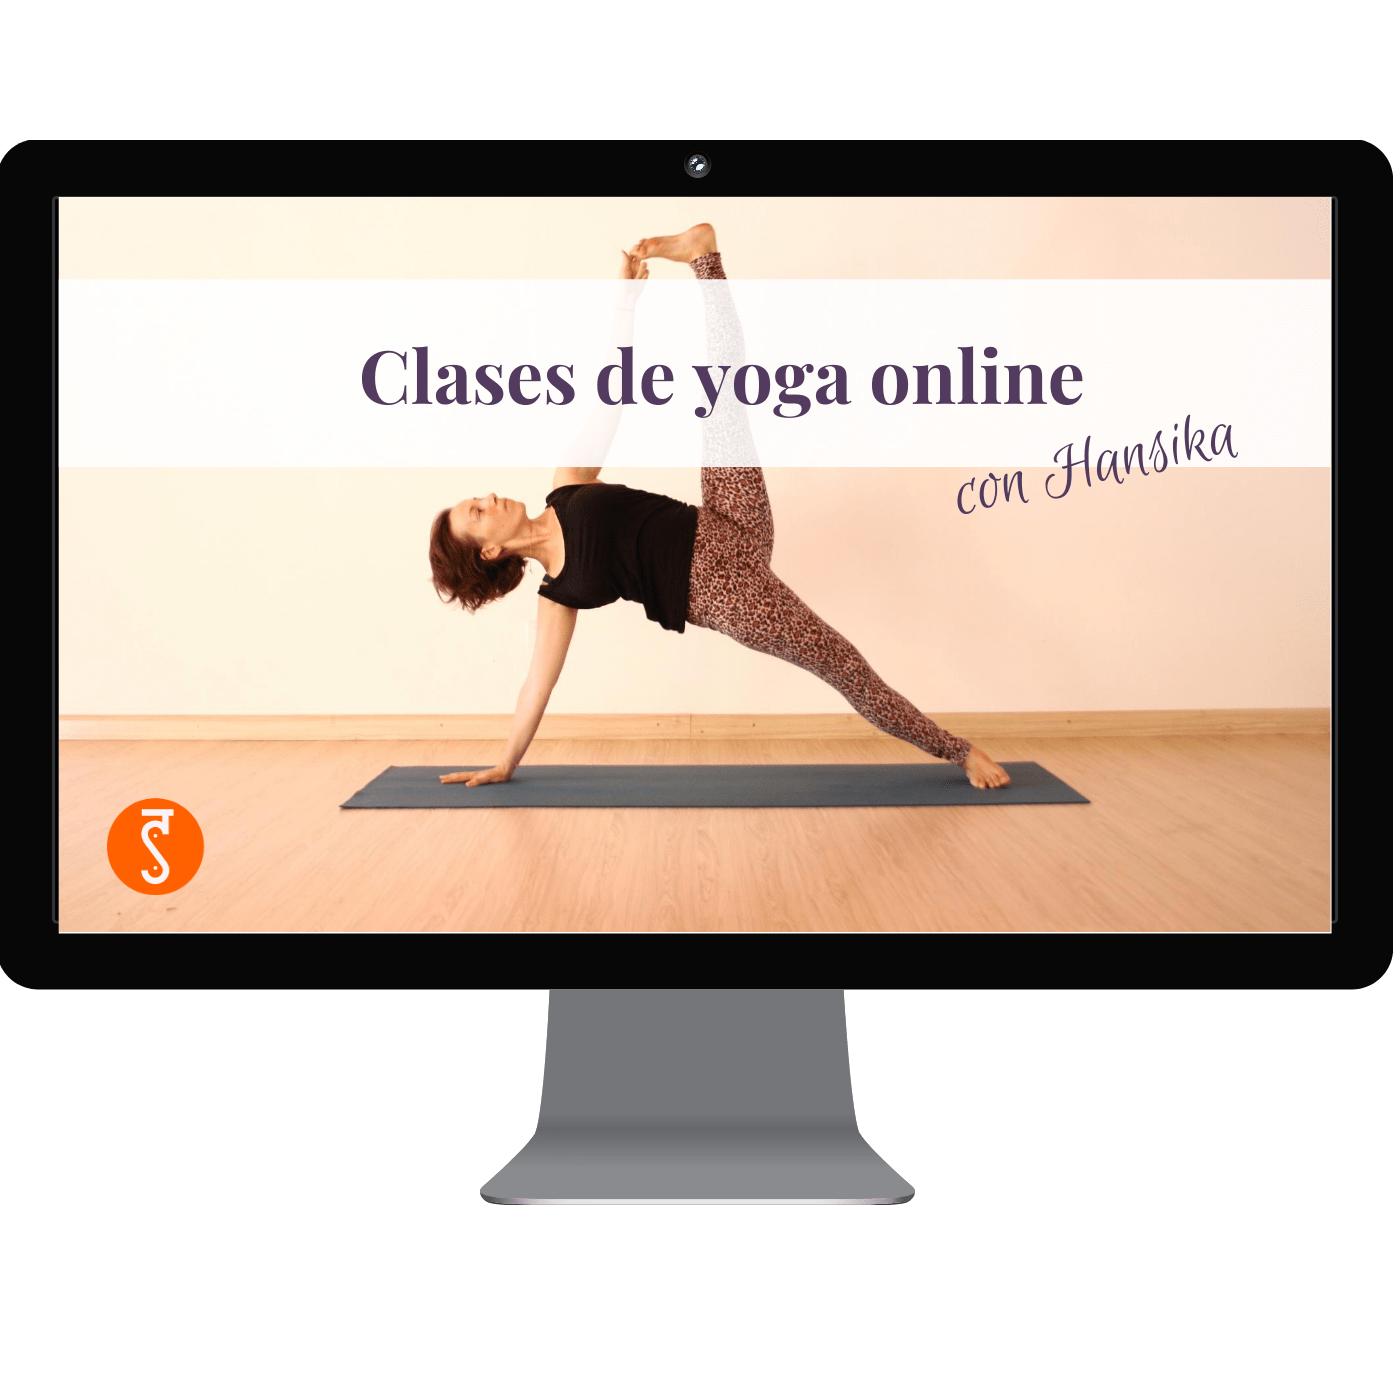 SC yogaonline